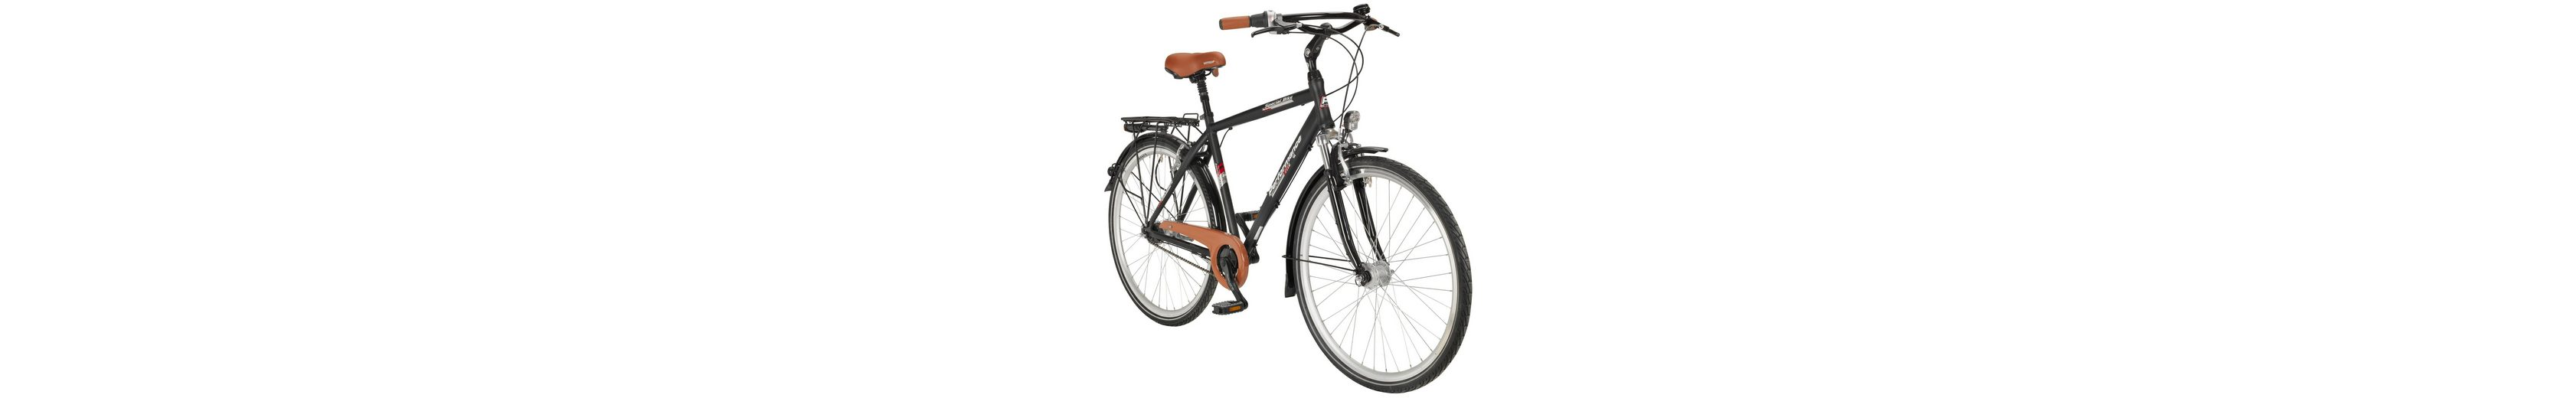 Citybike (Herren) »71,12 cm (28 Zoll)«